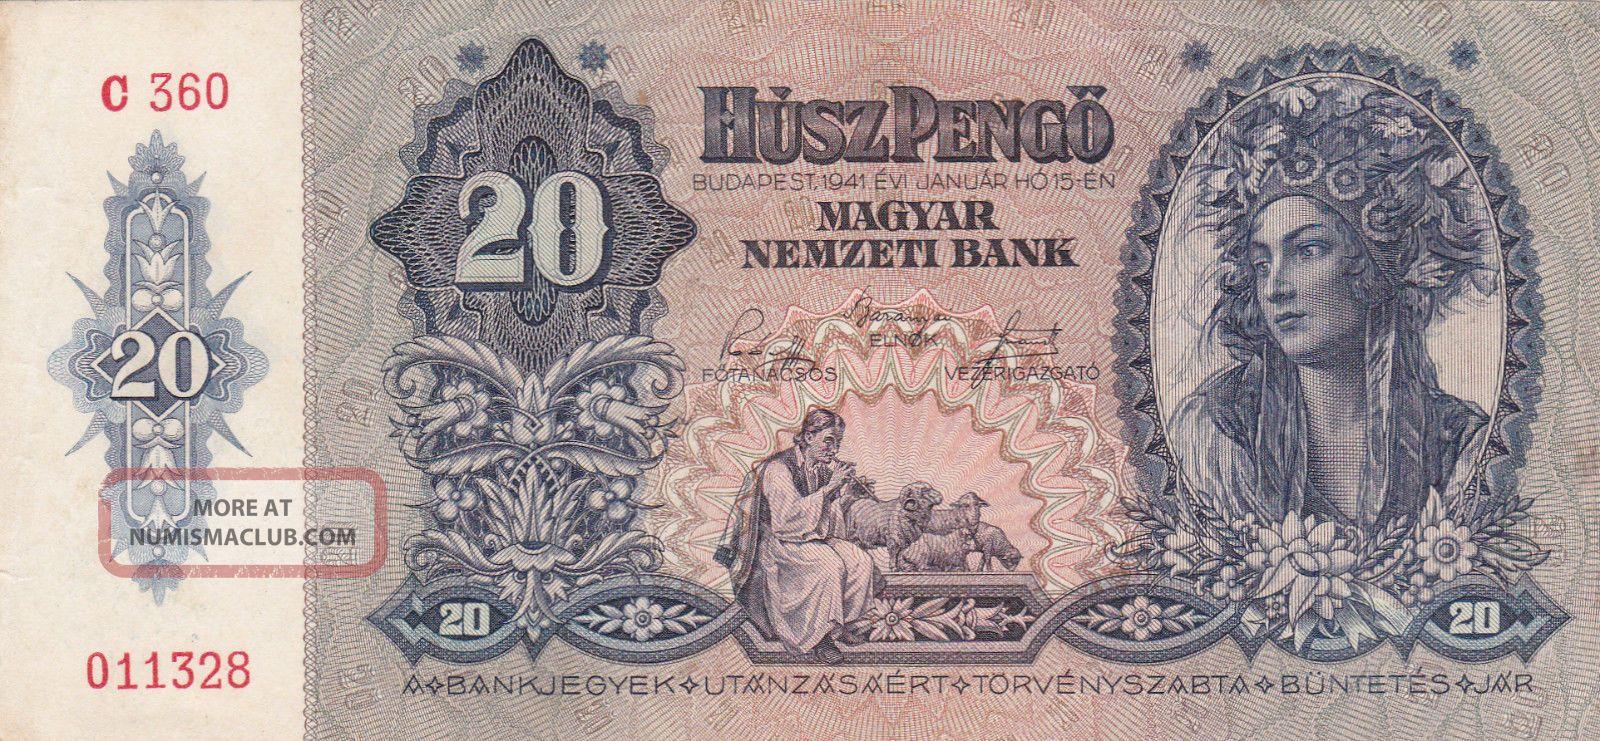 1152109653 2005 ancient history notes